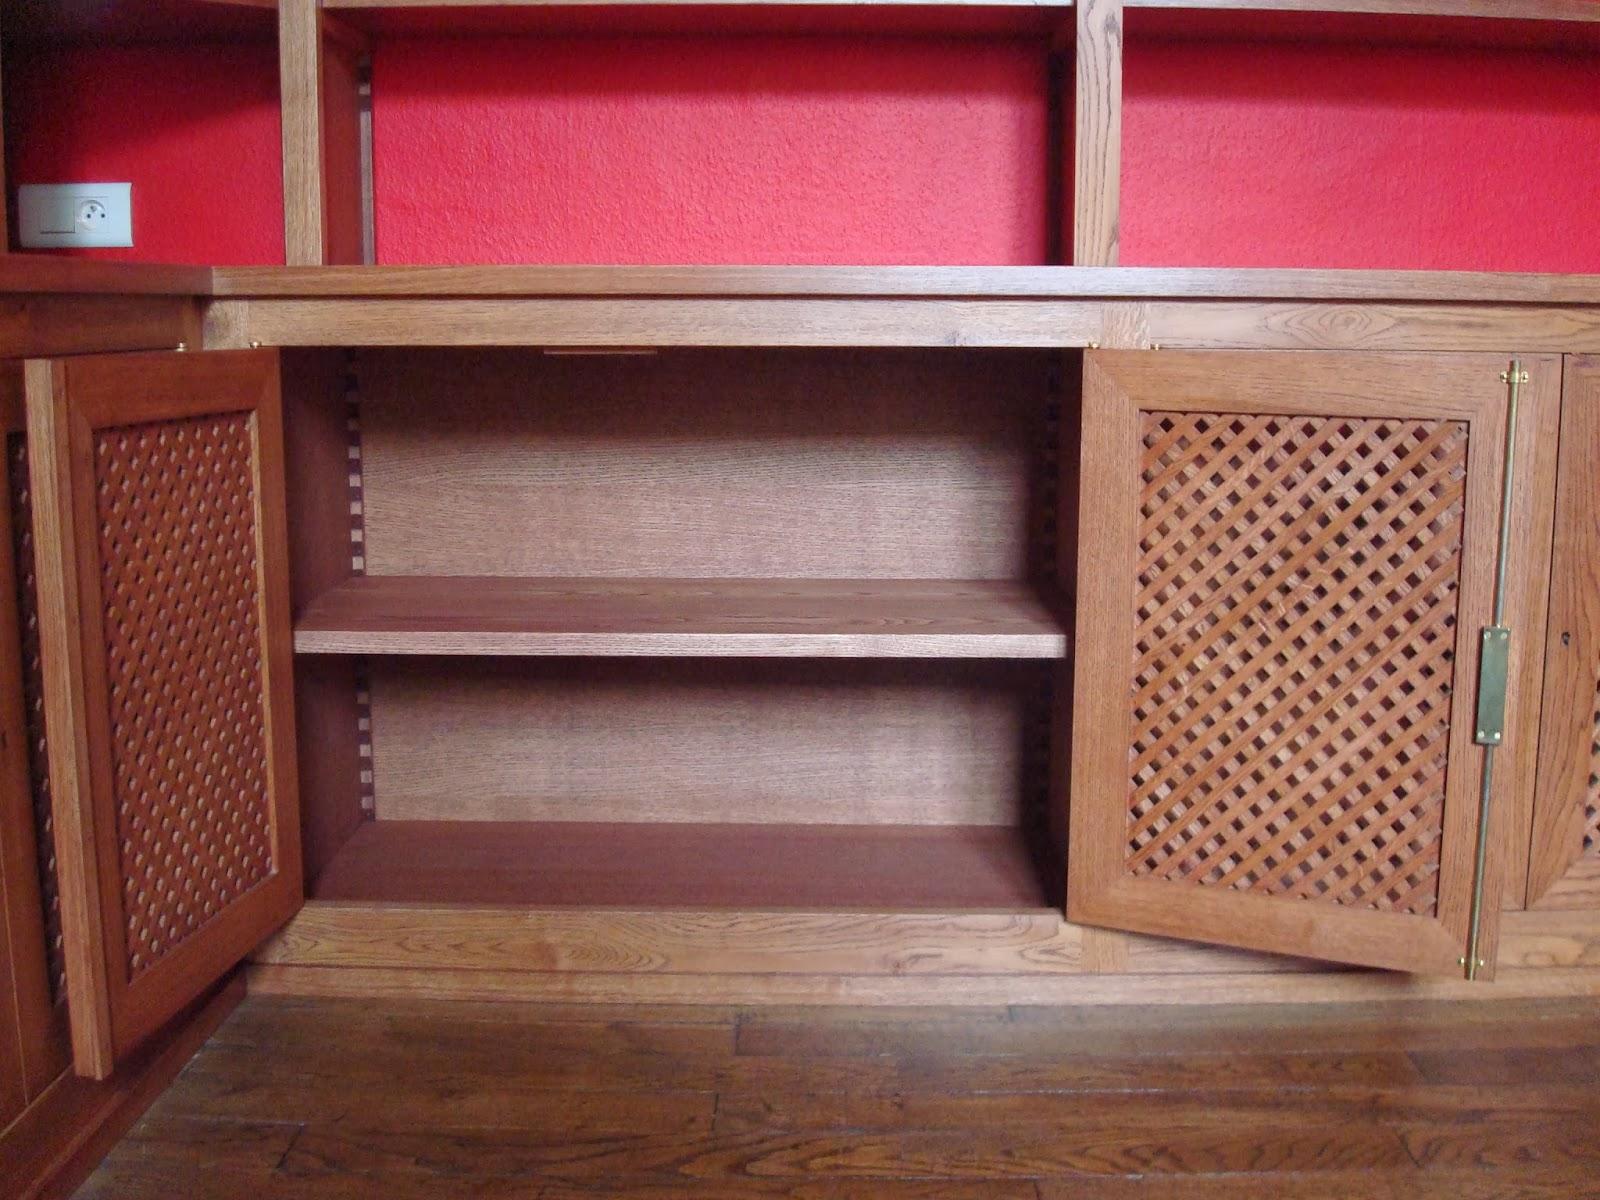 armand maury eb niste revel 31 eb nisterie. Black Bedroom Furniture Sets. Home Design Ideas